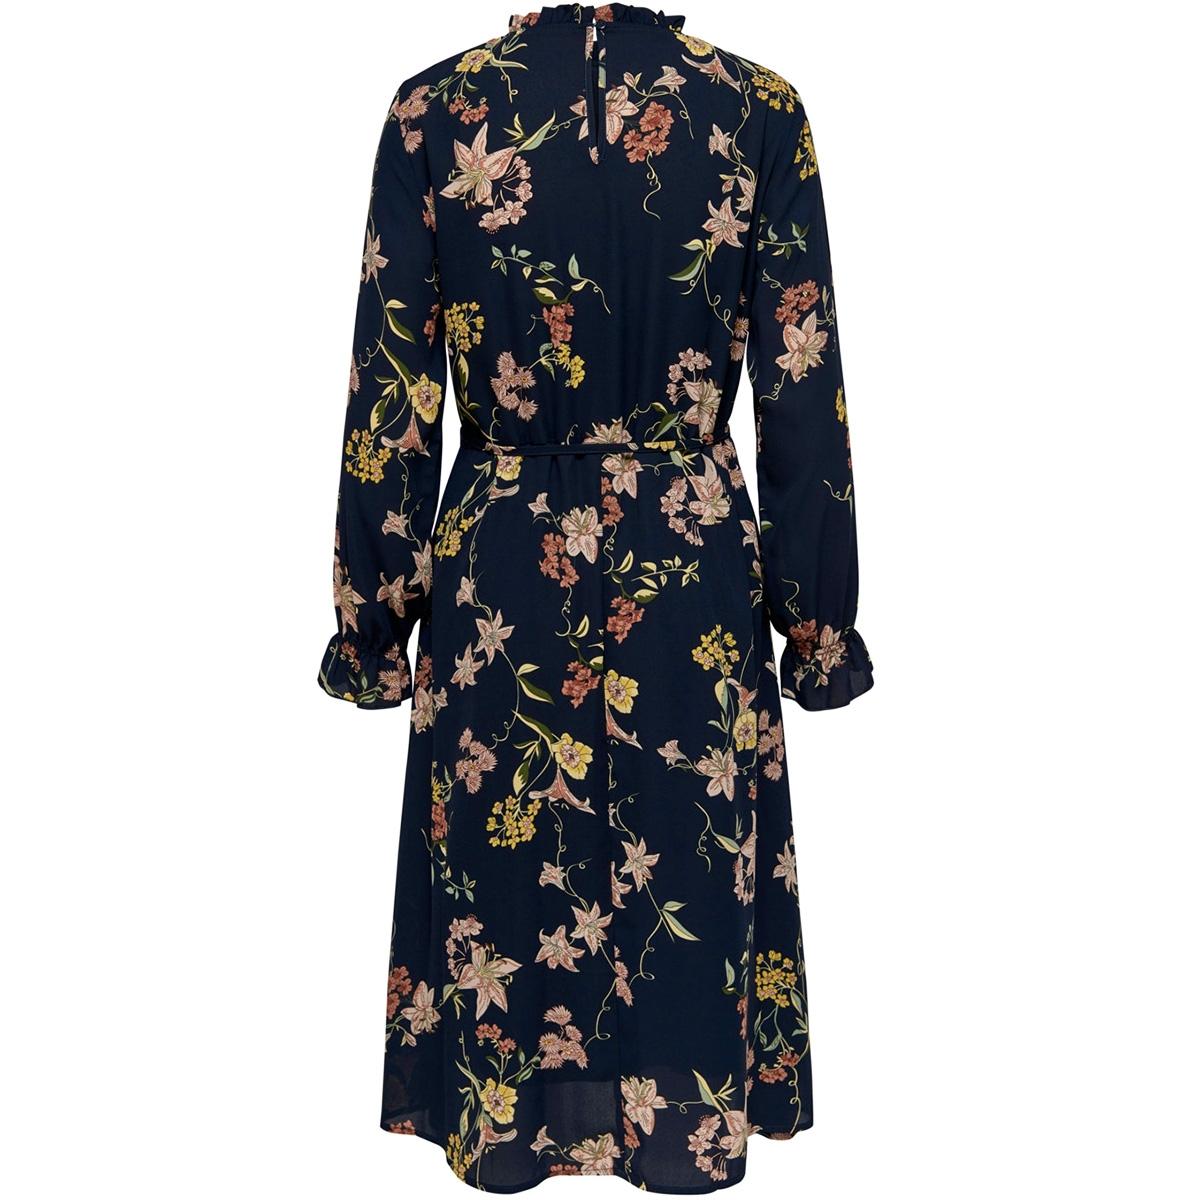 jdyjade l/s long dress wvn 15198844 jacqueline de yong jurk navy blazer/floral